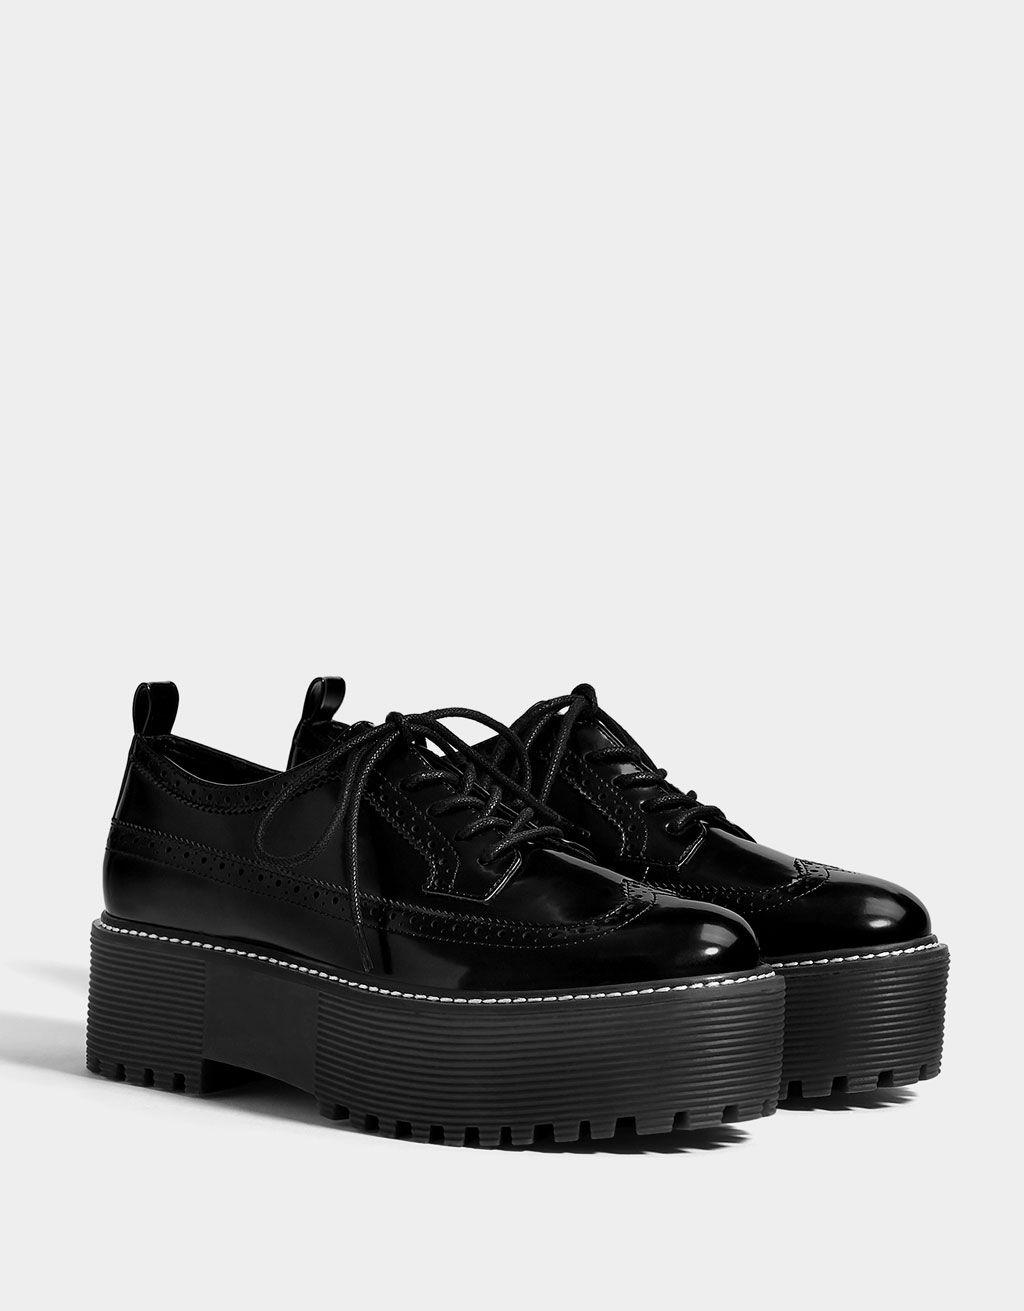 Platform Brogues Aesthetic Shoes Dark Shoe Goth Shoes